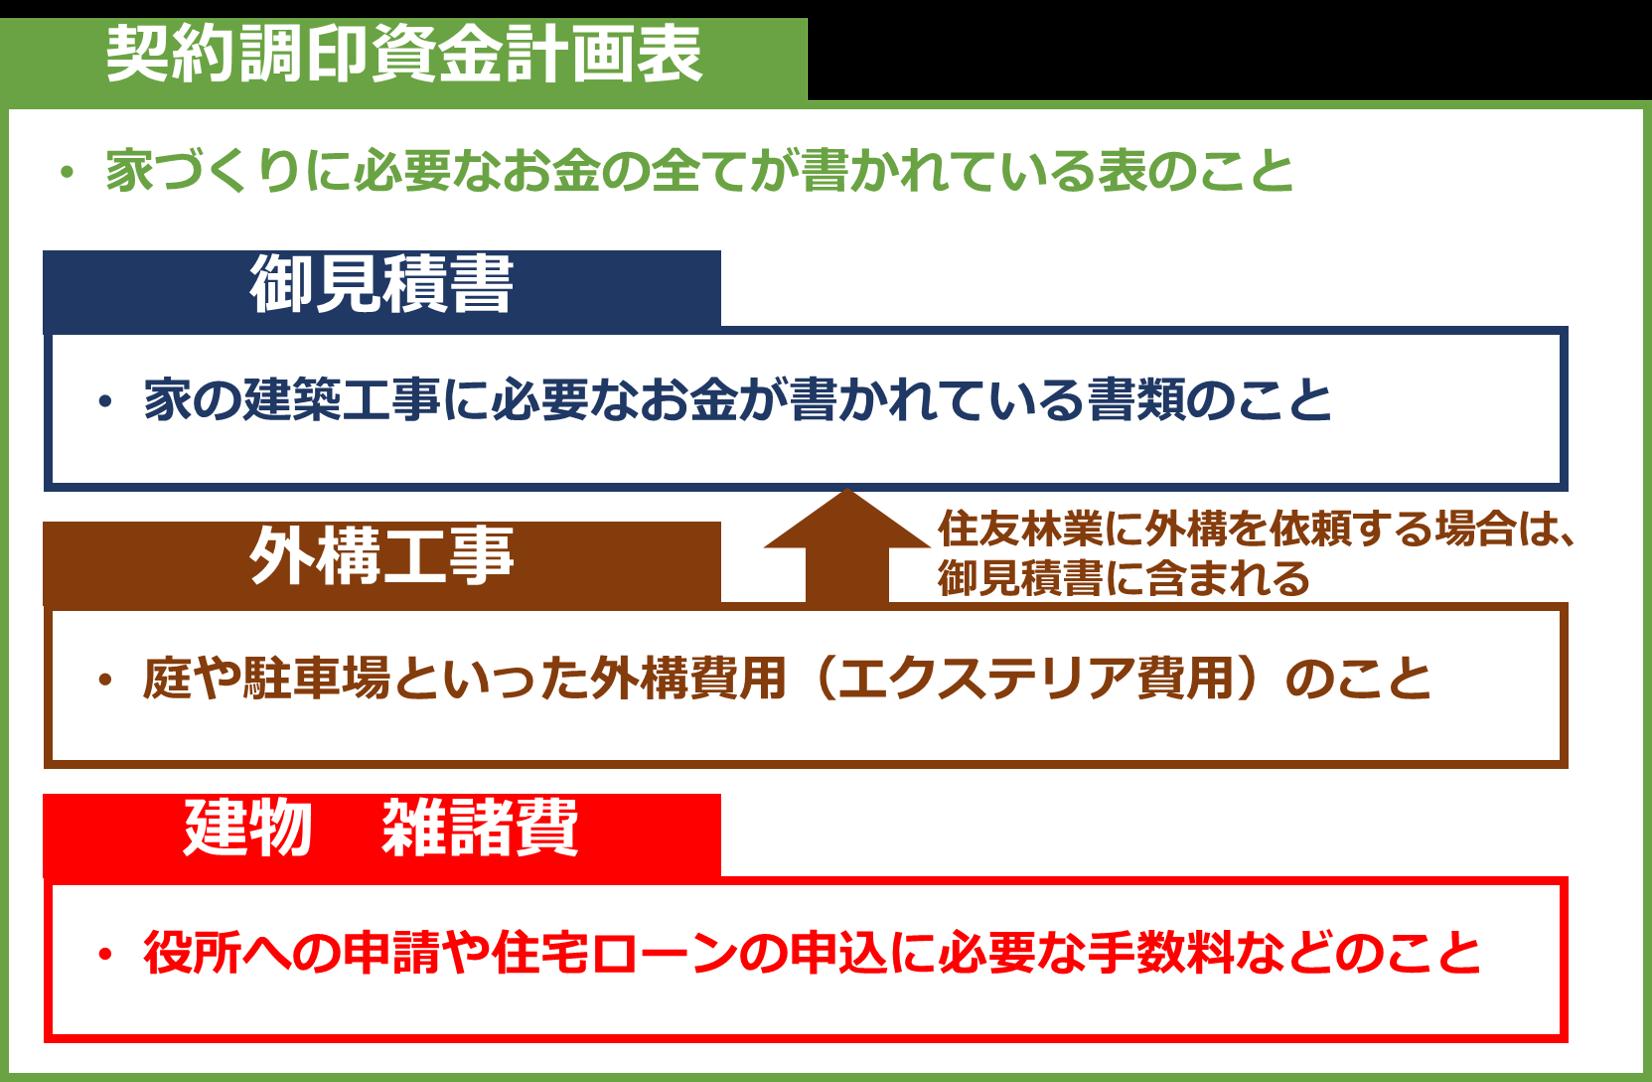 契約調印資金計画書と御見積書の関係